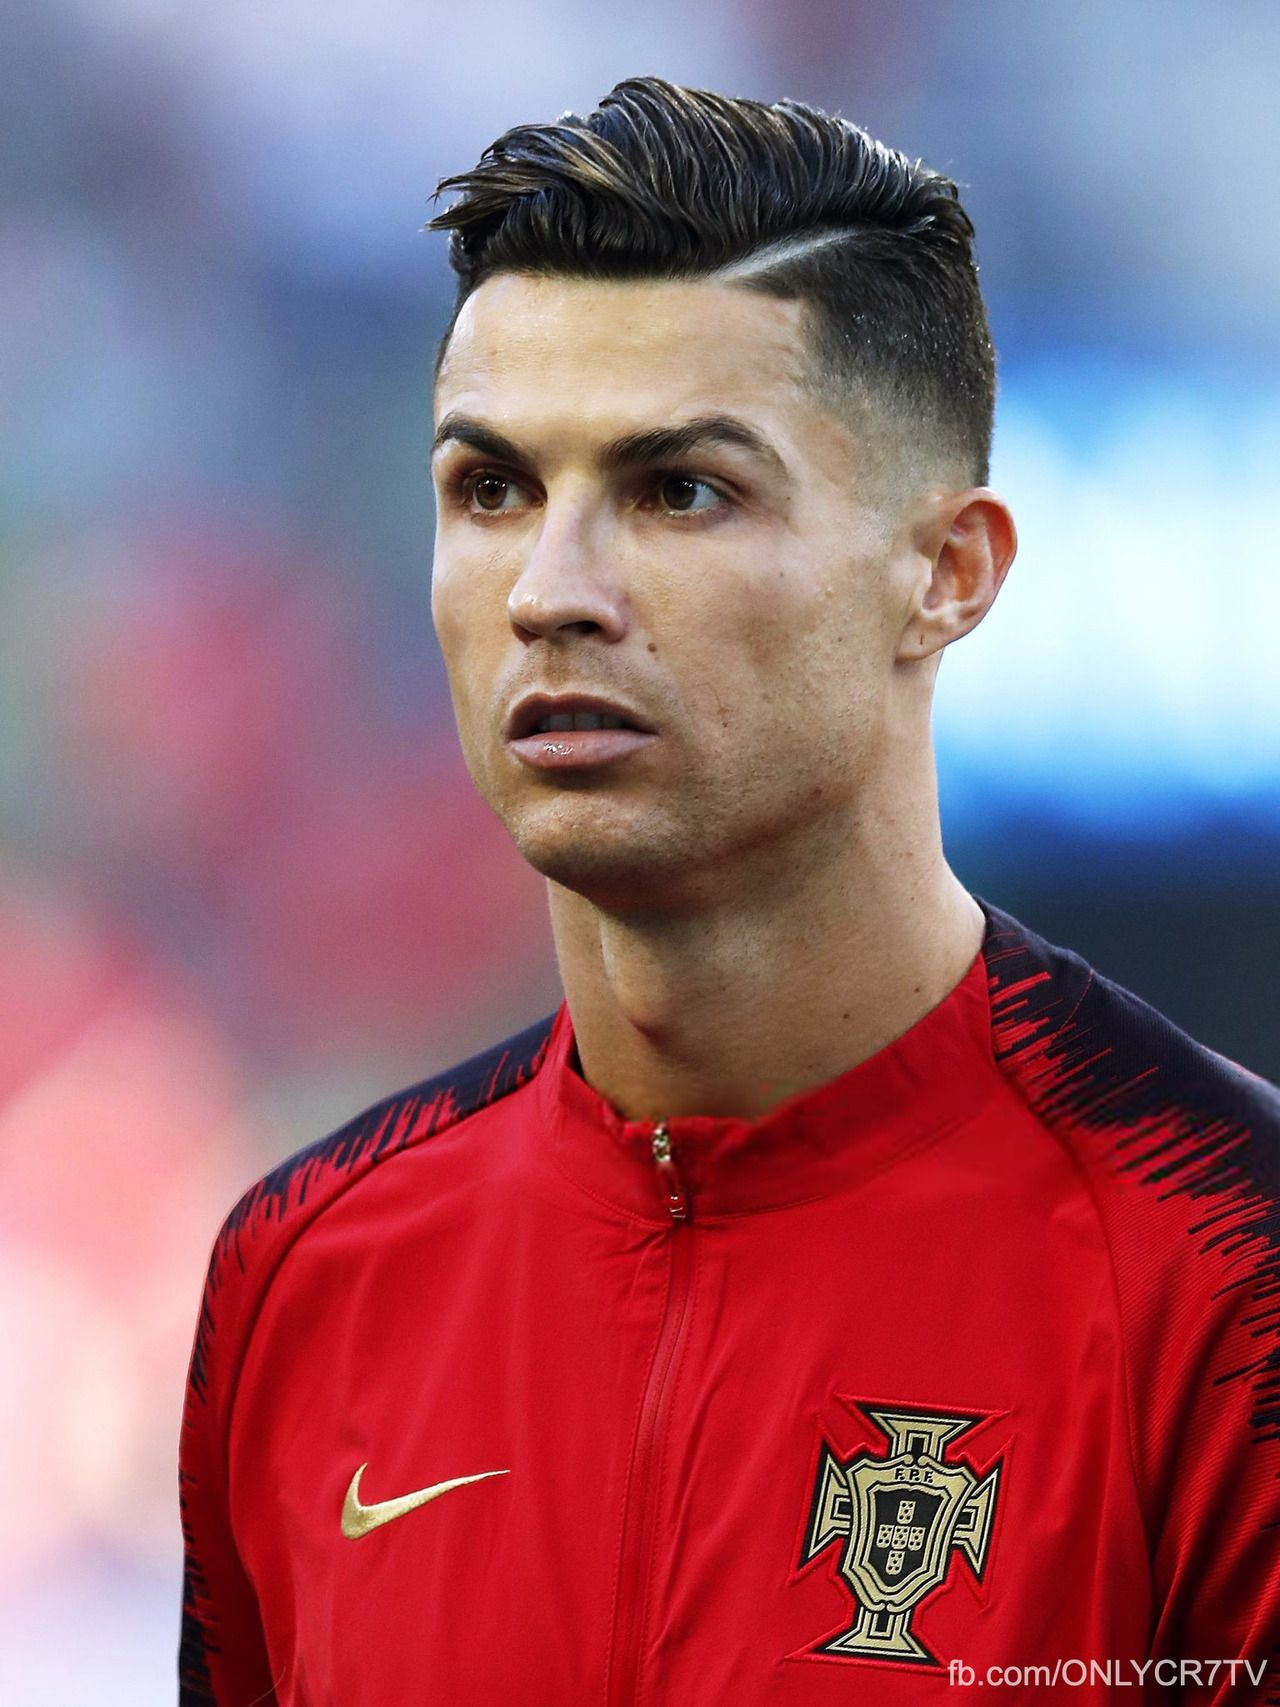 Cr7 Cristiano Ronaldo Haircut Cristiano Ronaldo Hairstyle Cristiano Ronaldo Juventus